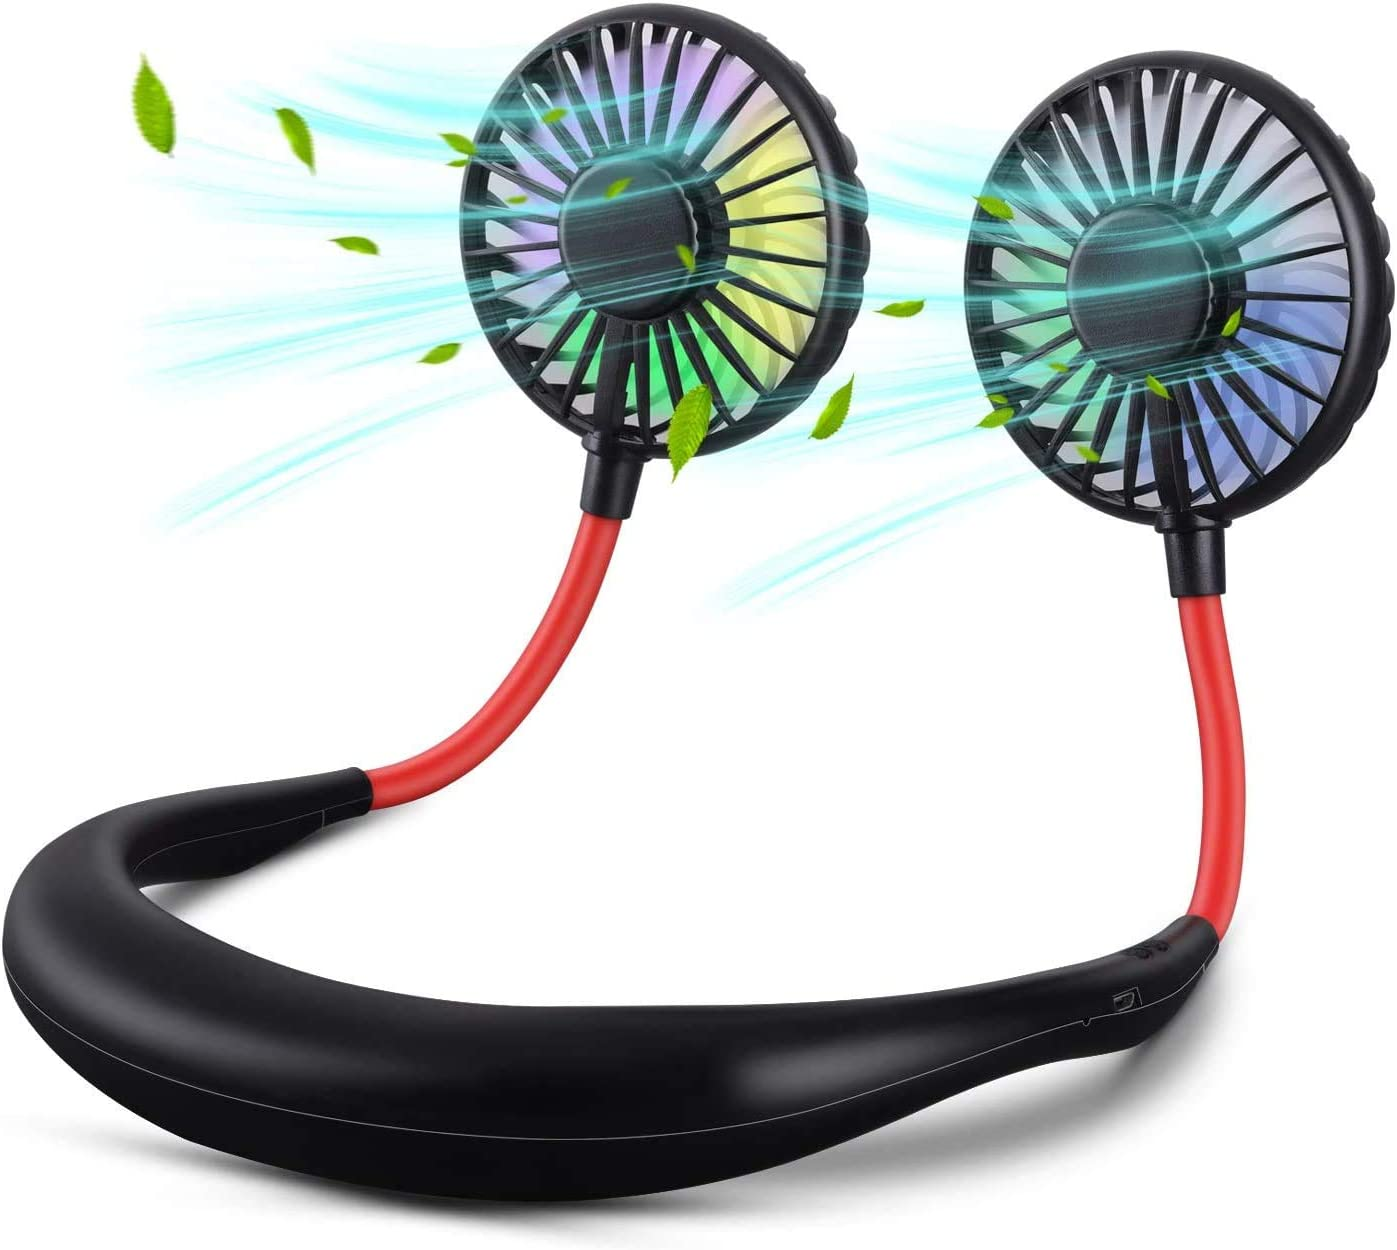 Neck Hanging Fan - Hand Free Portable Neck Sports Fans, USB Rechargeable Personal Wearable Fan Premium Headphone Design Mini Neckband Fan for Office Outdoor Travel